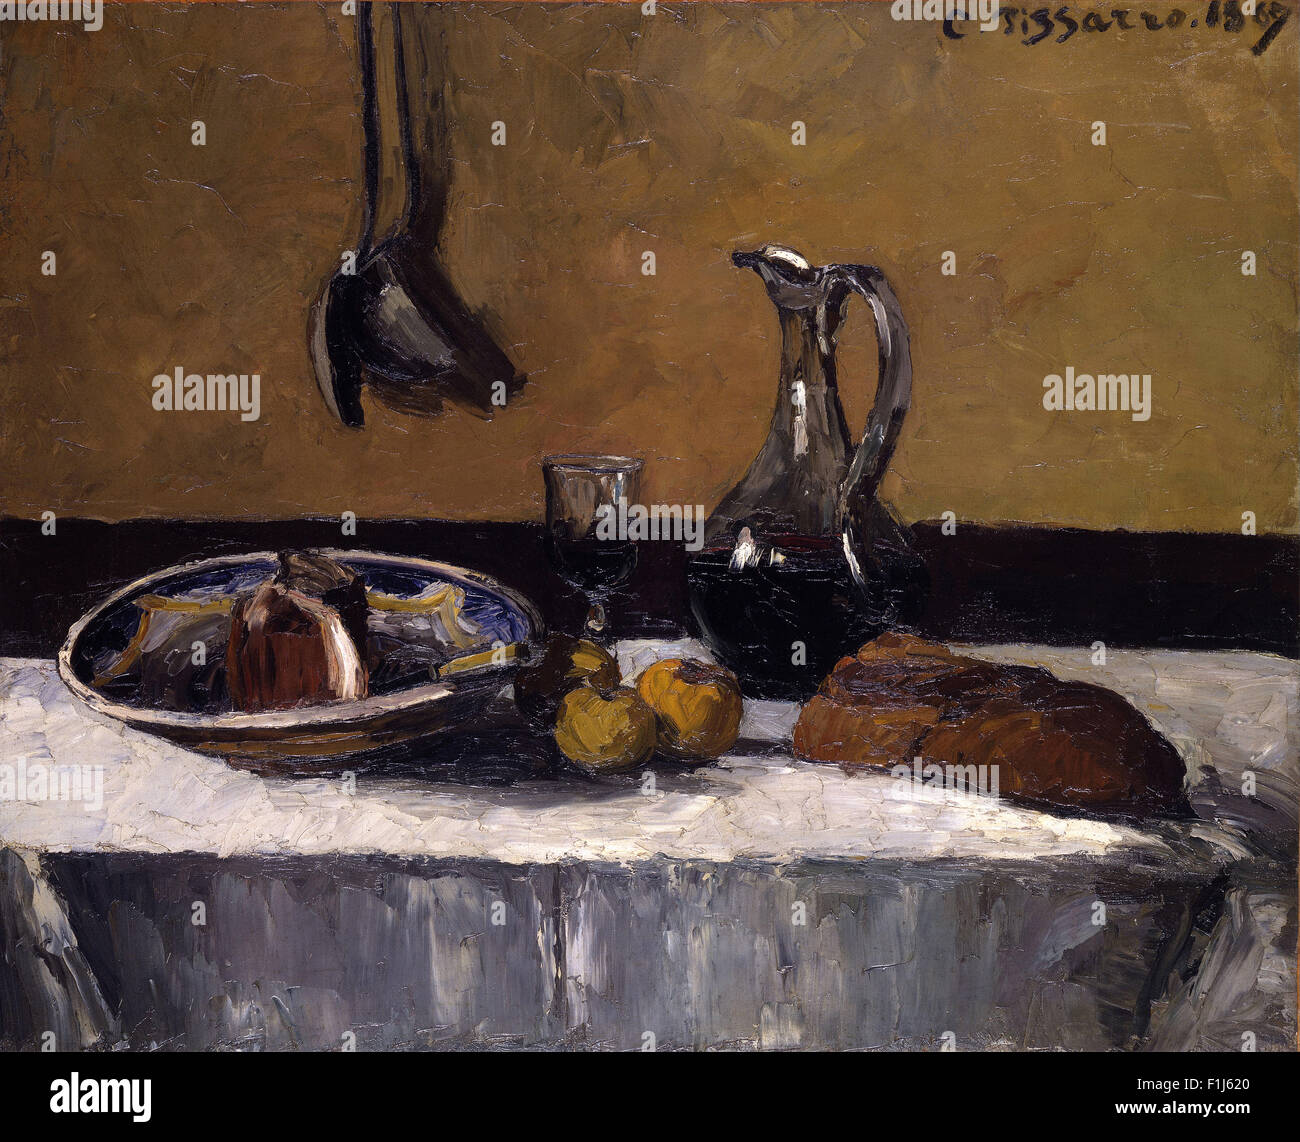 Camille Pissarro - Still Life - Stock Image